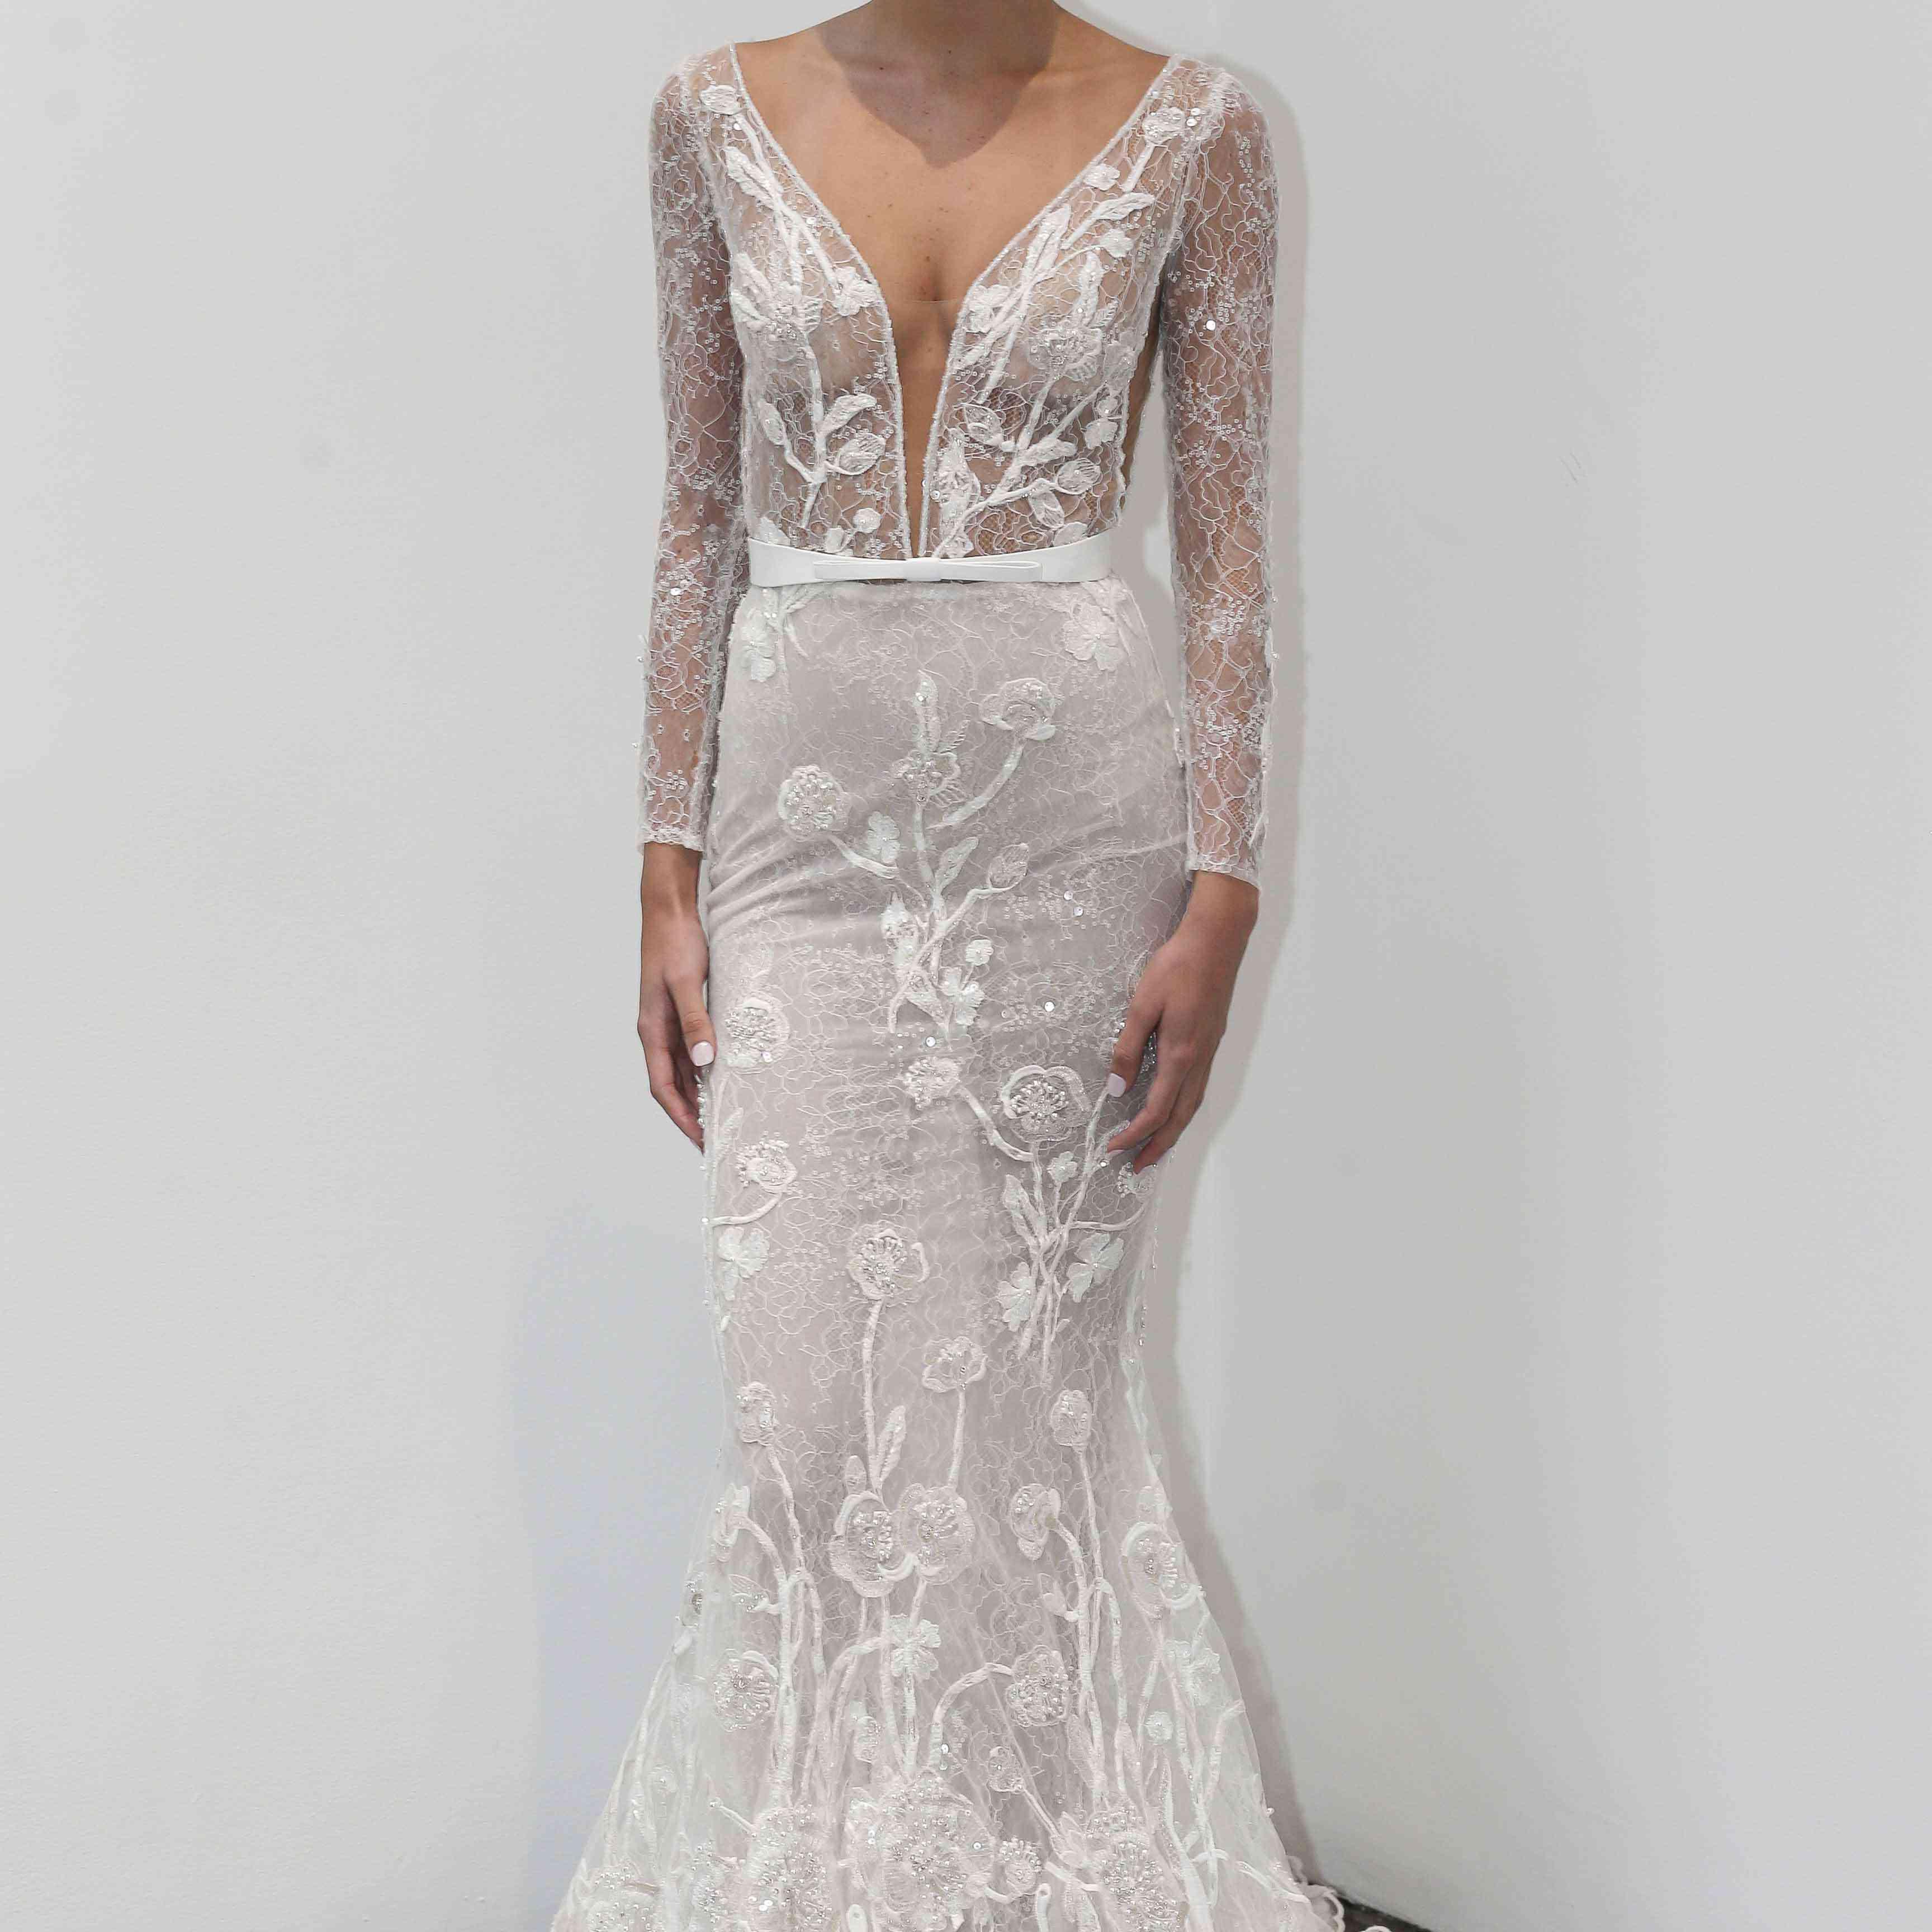 Peony long sleeve wedding dress